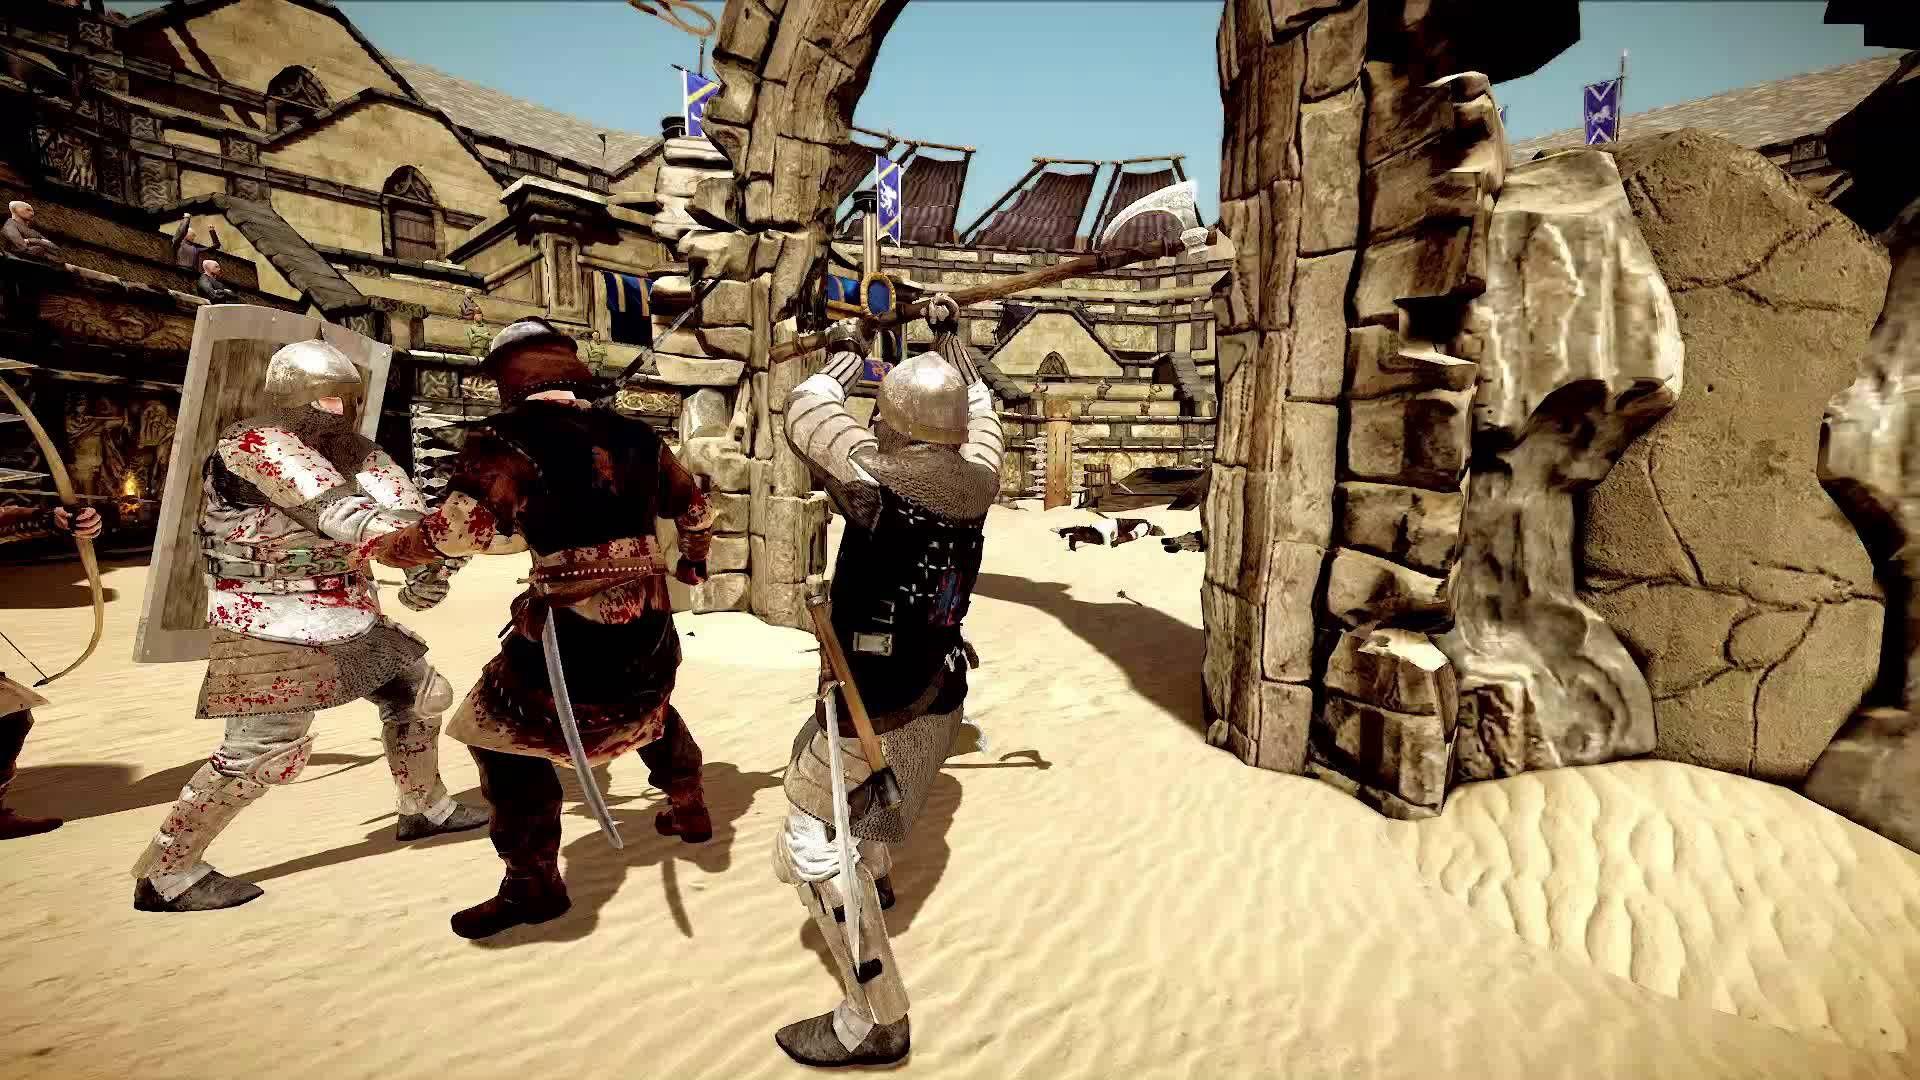 Chivalry: Medieval Warfare PS4/Xbox One Announcement Trailer